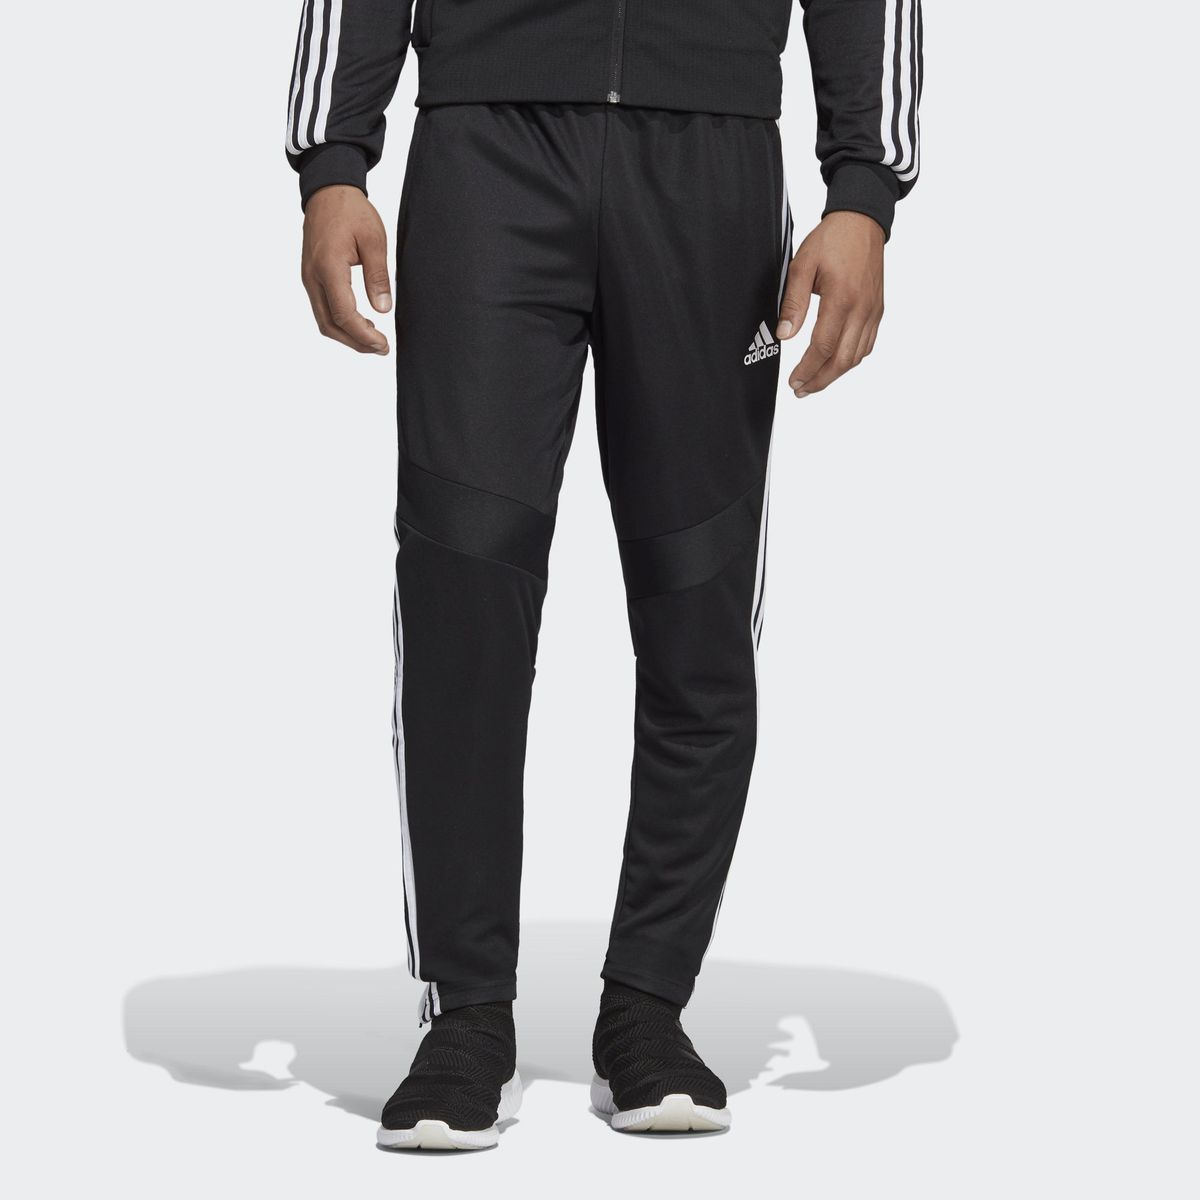 jogging homme adidas xl